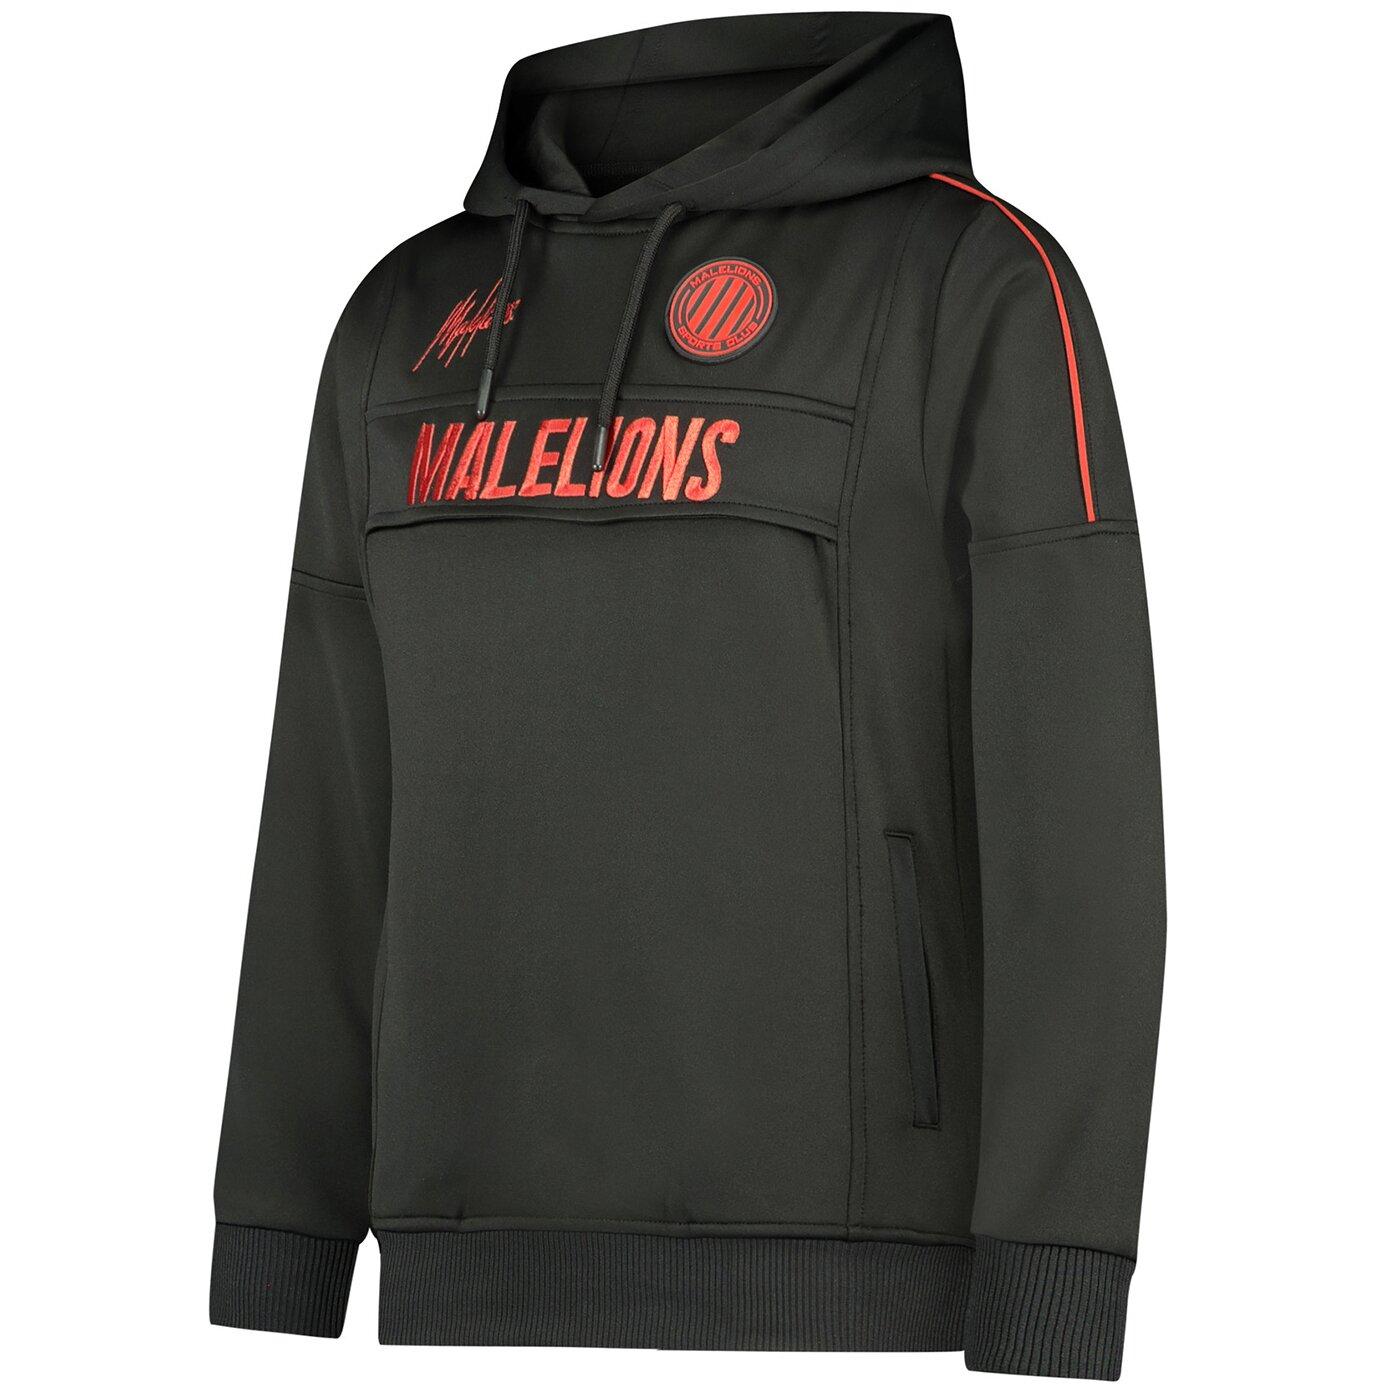 Malelions Sport Warming Up Hoodie Black Red